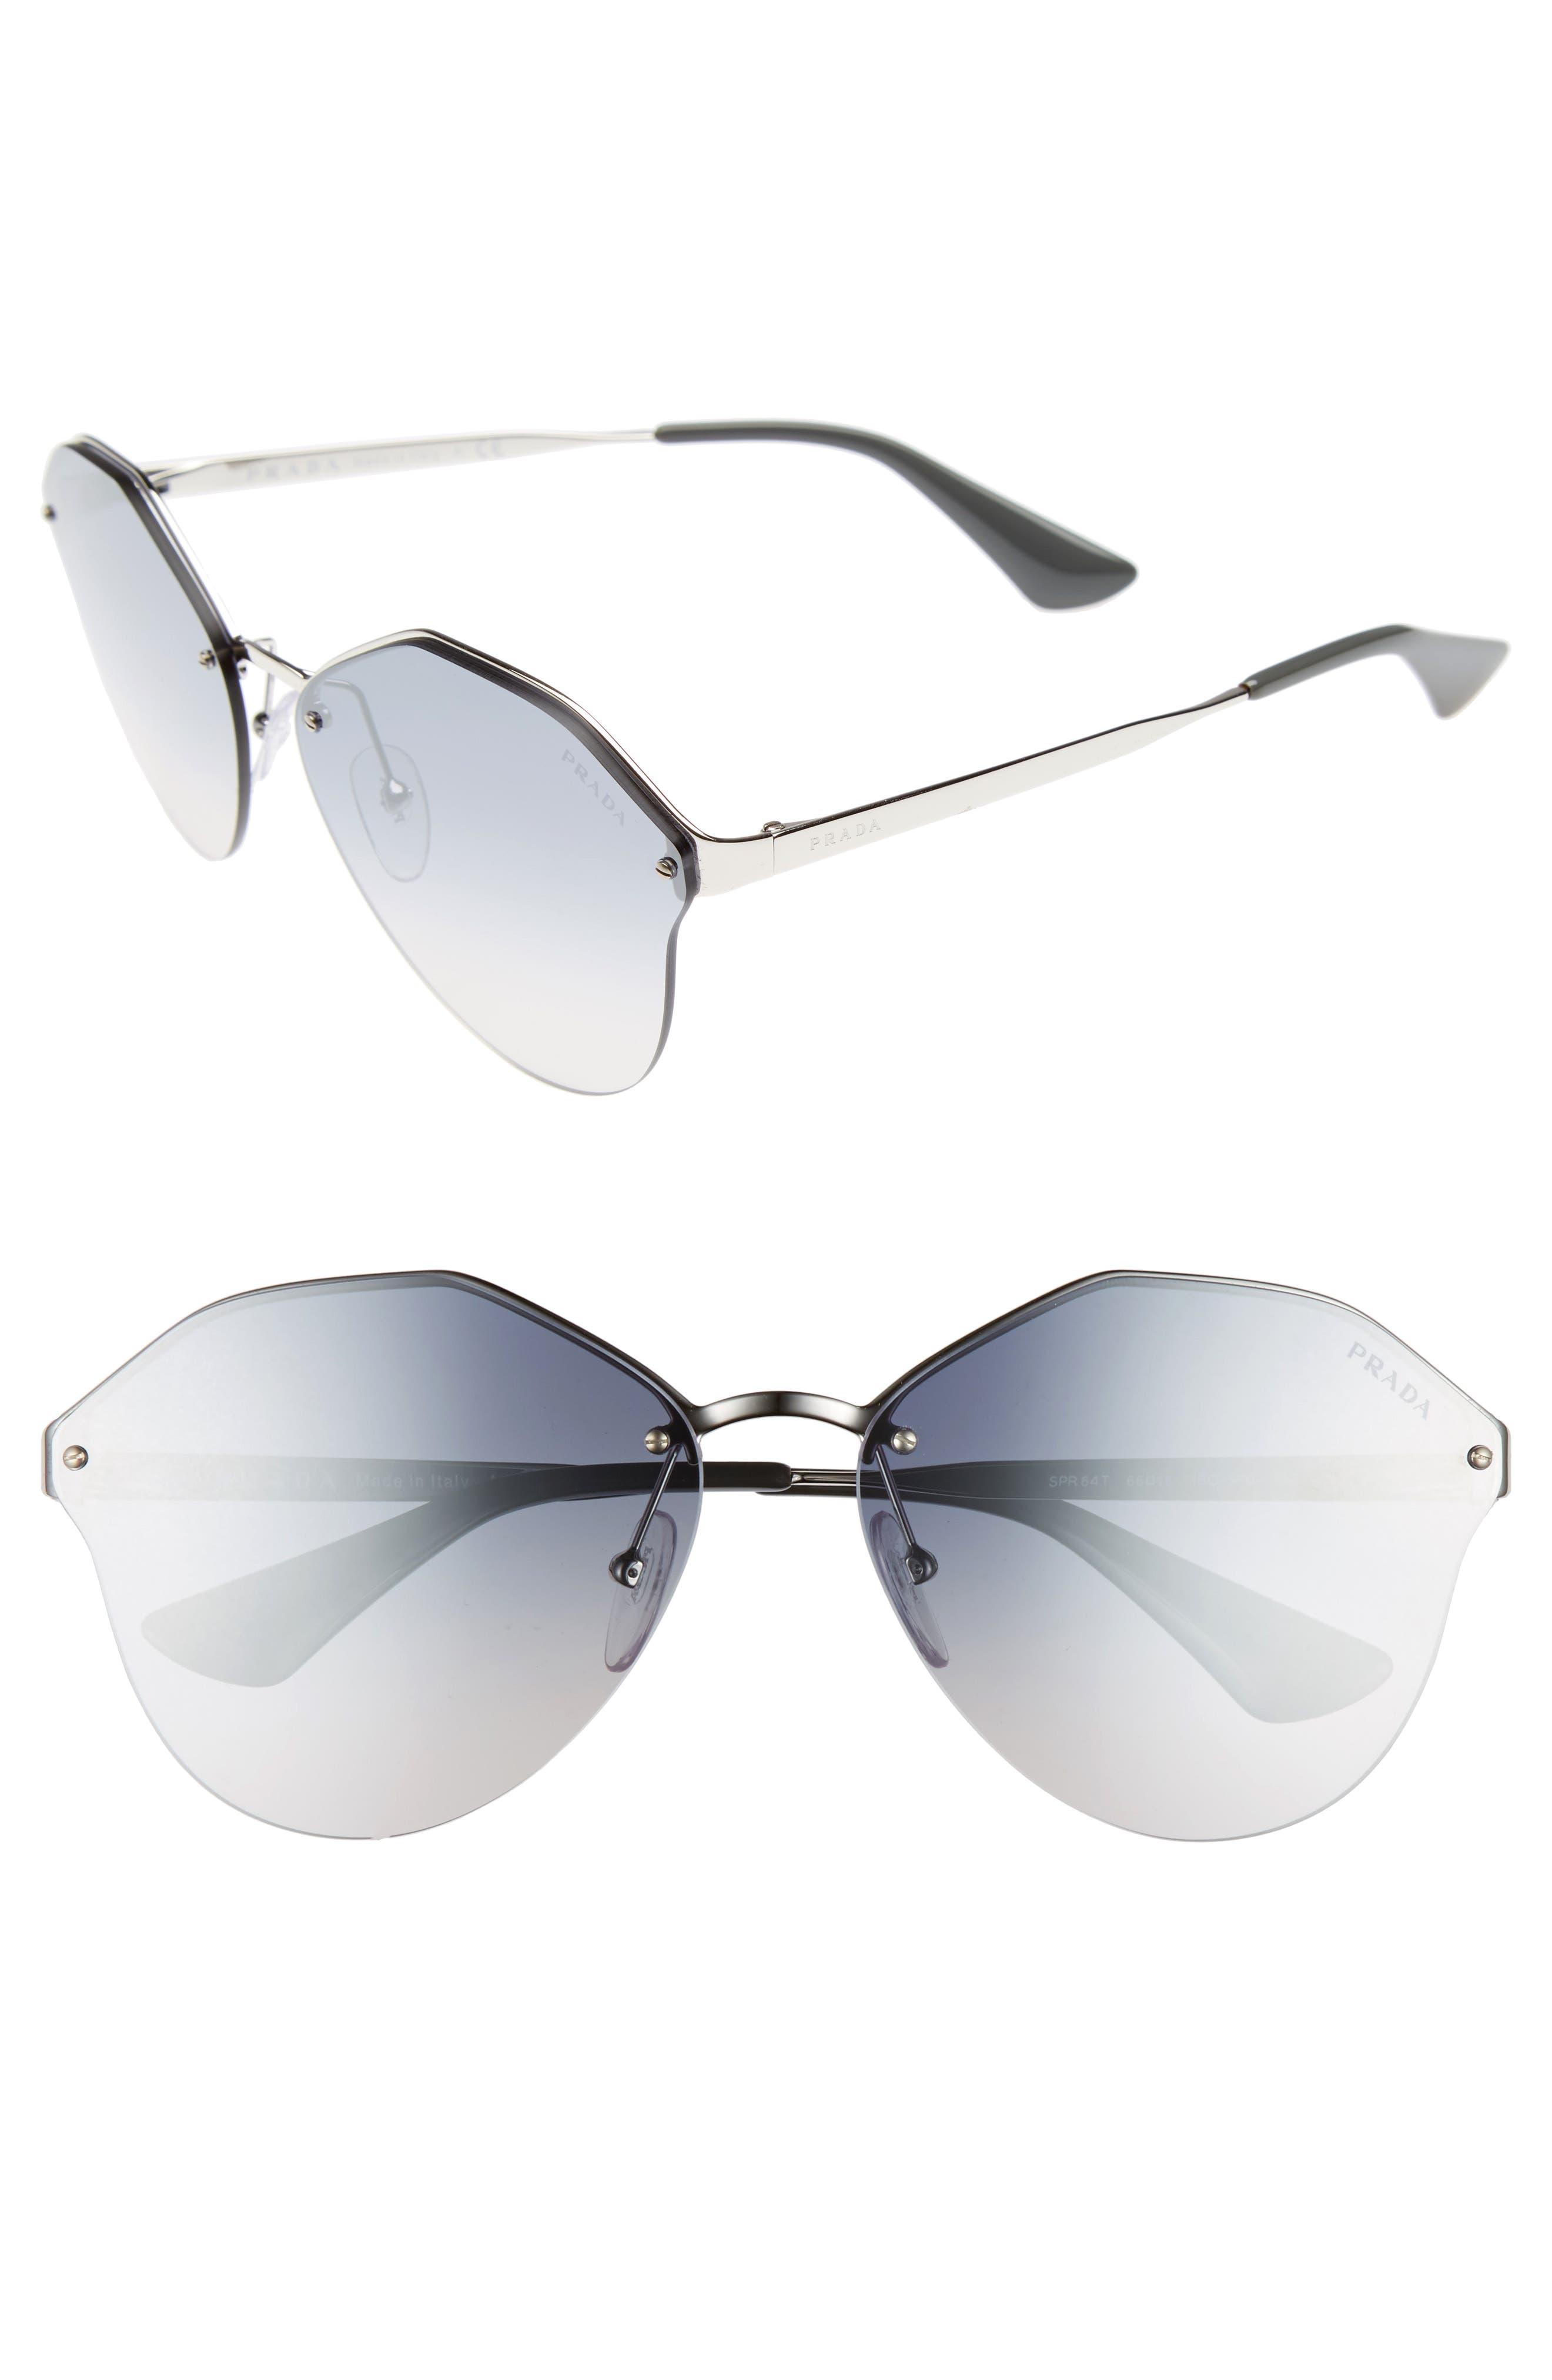 66mm Gradient Rimless Sunglasses,                             Main thumbnail 1, color,                             040